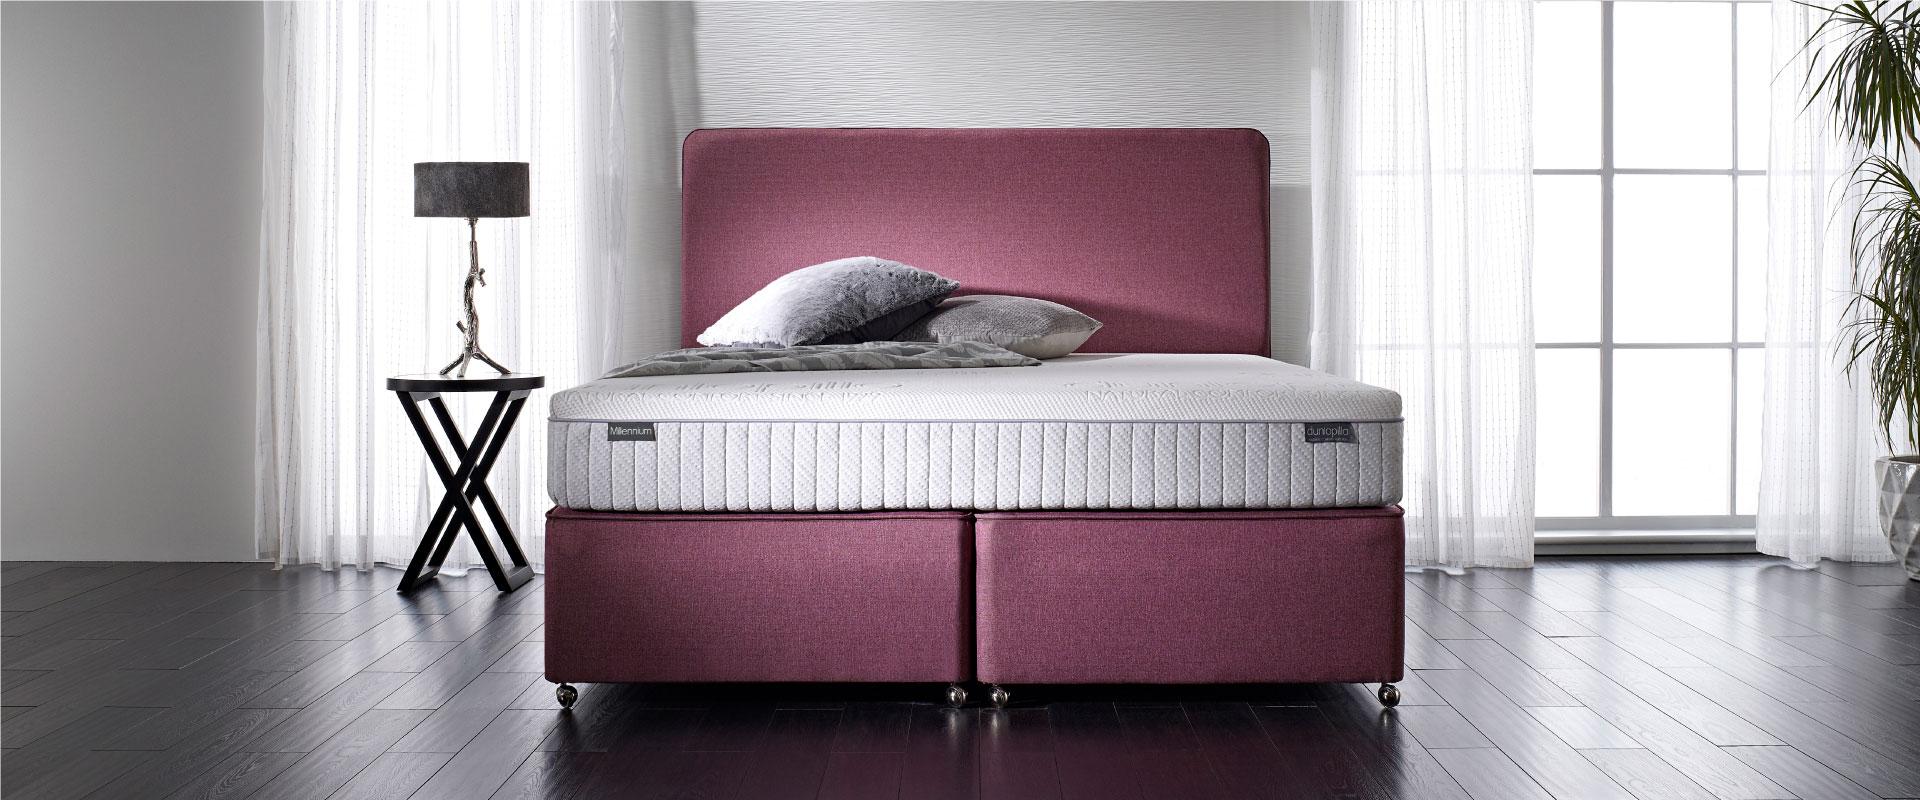 dunlopillo mattress reviews consumer s ratings coupon listed